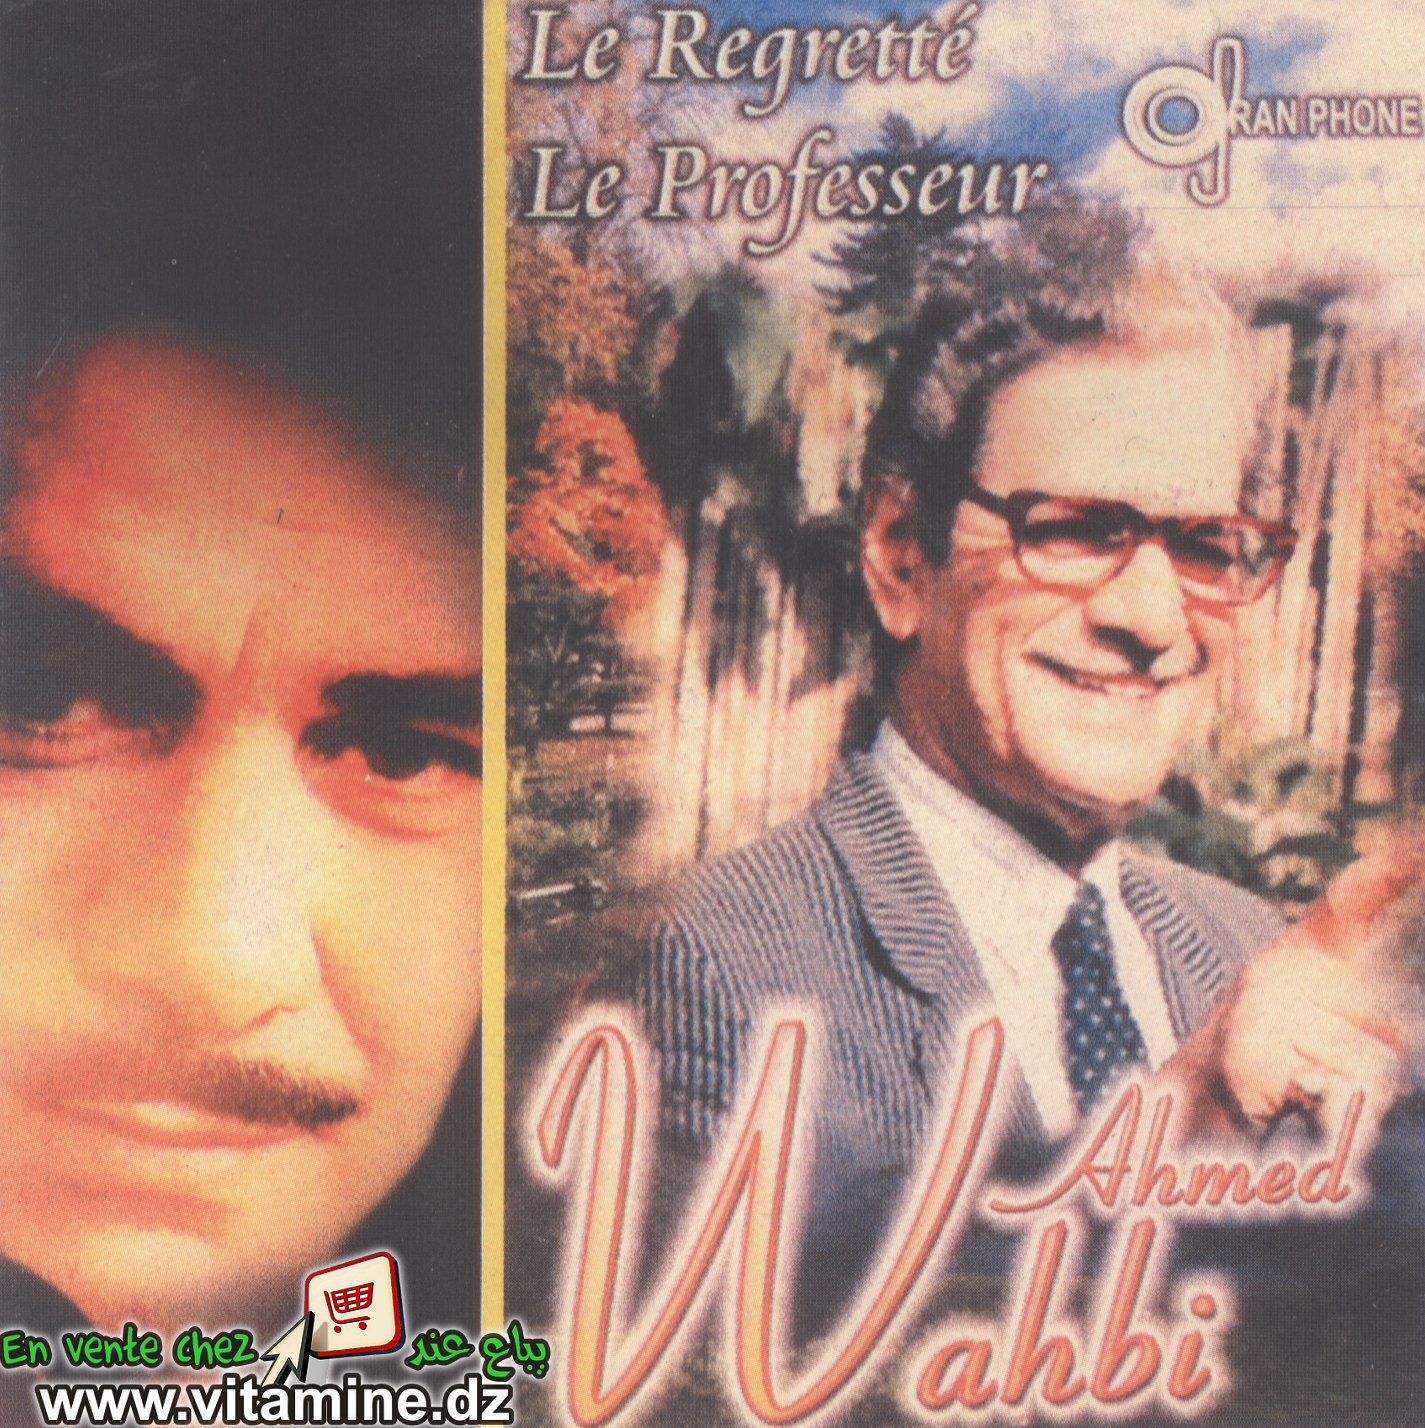 Ahmed Wahbi - compilation